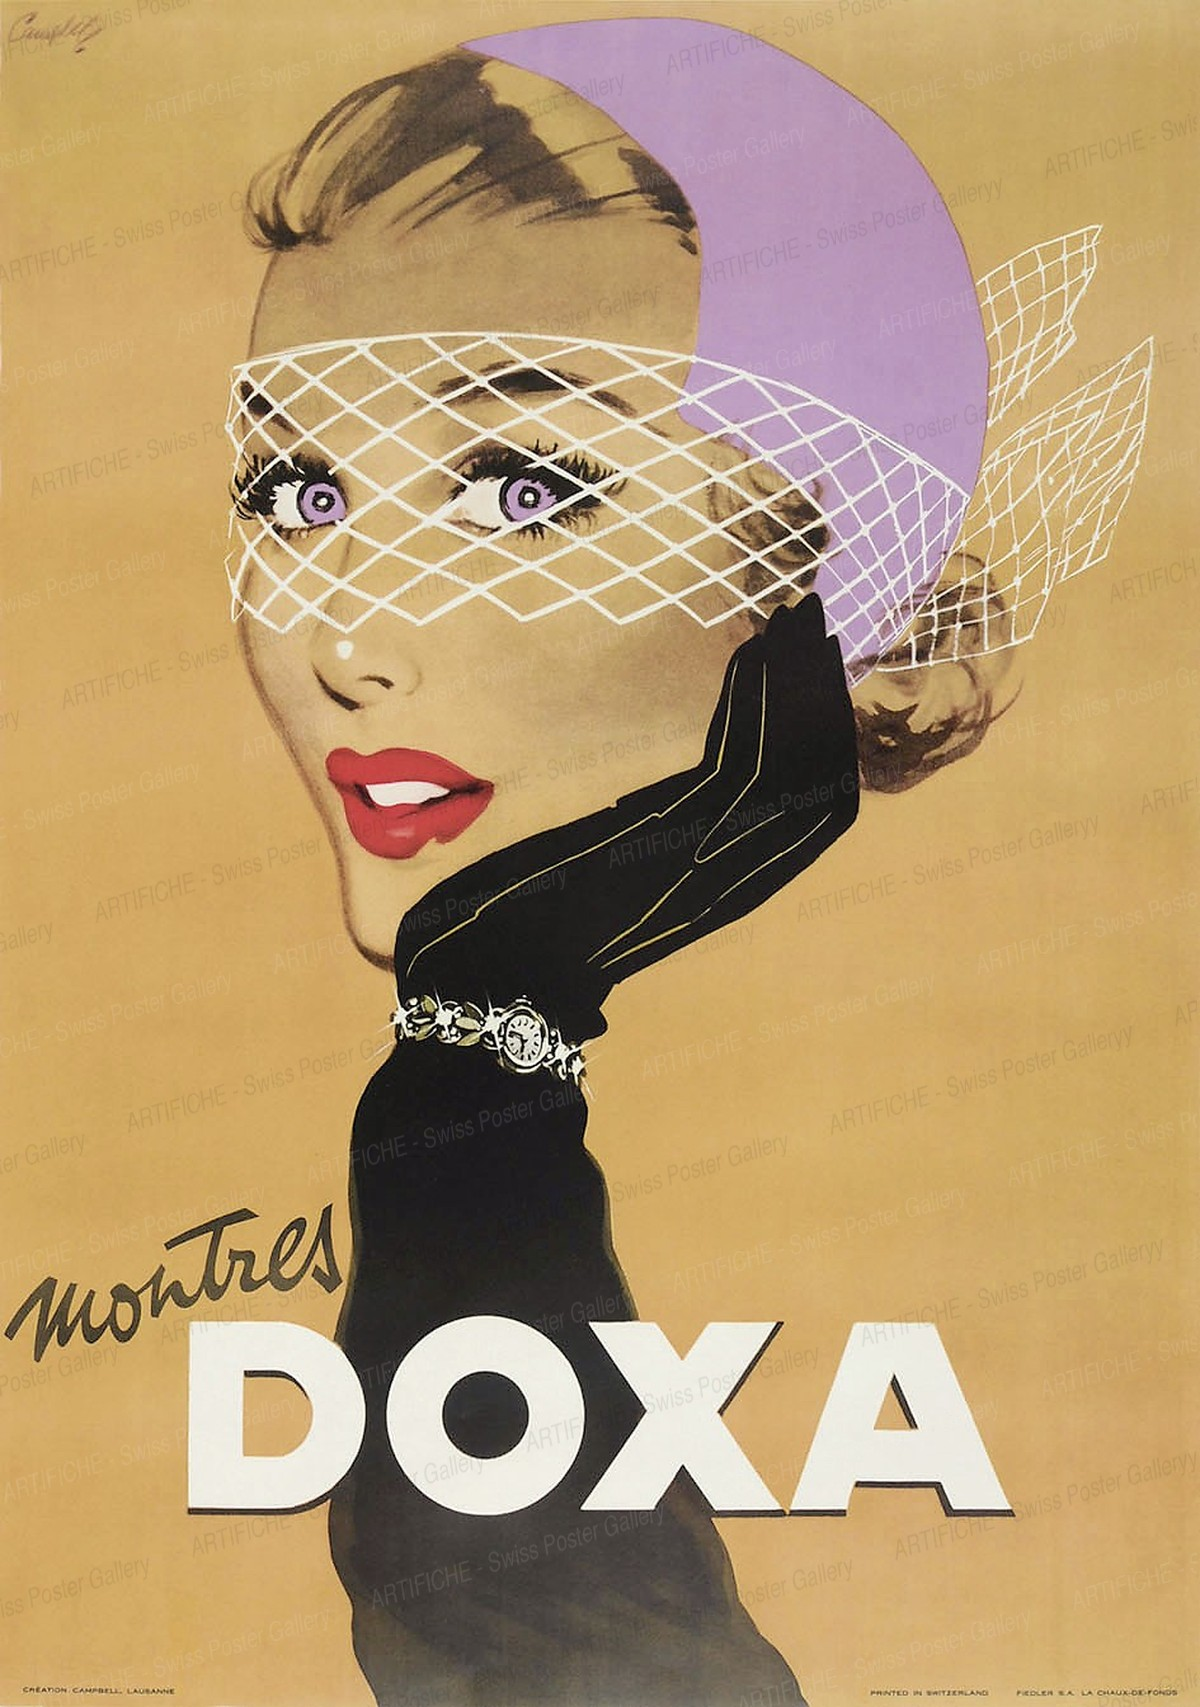 Montres DOXA, Marcus Campbell